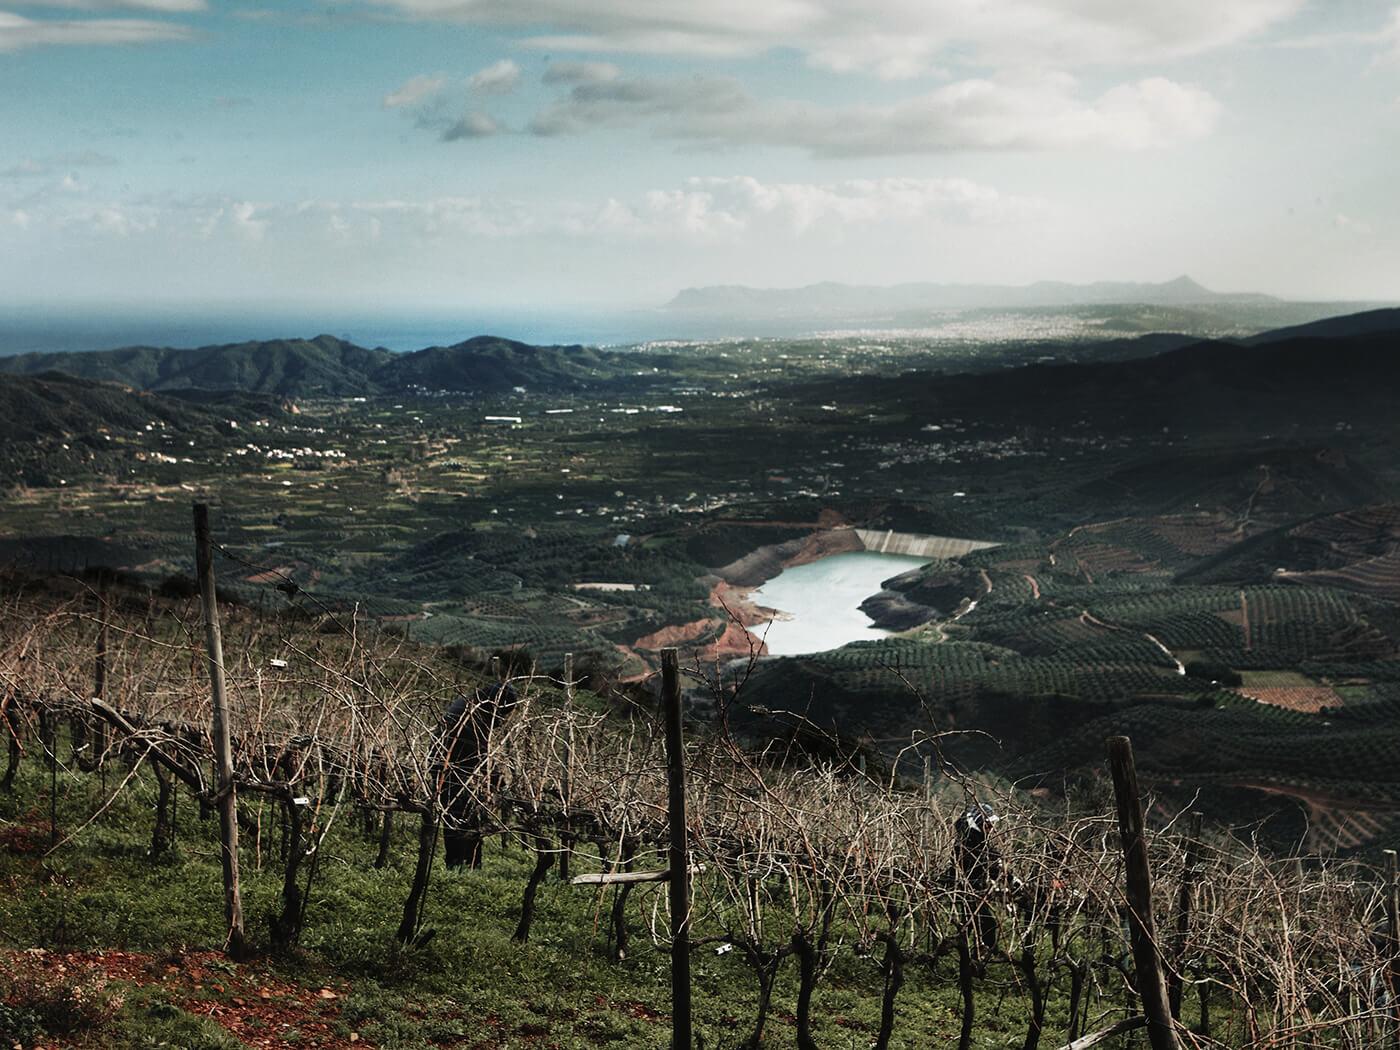 Manousakis Winery – Nostos Wines